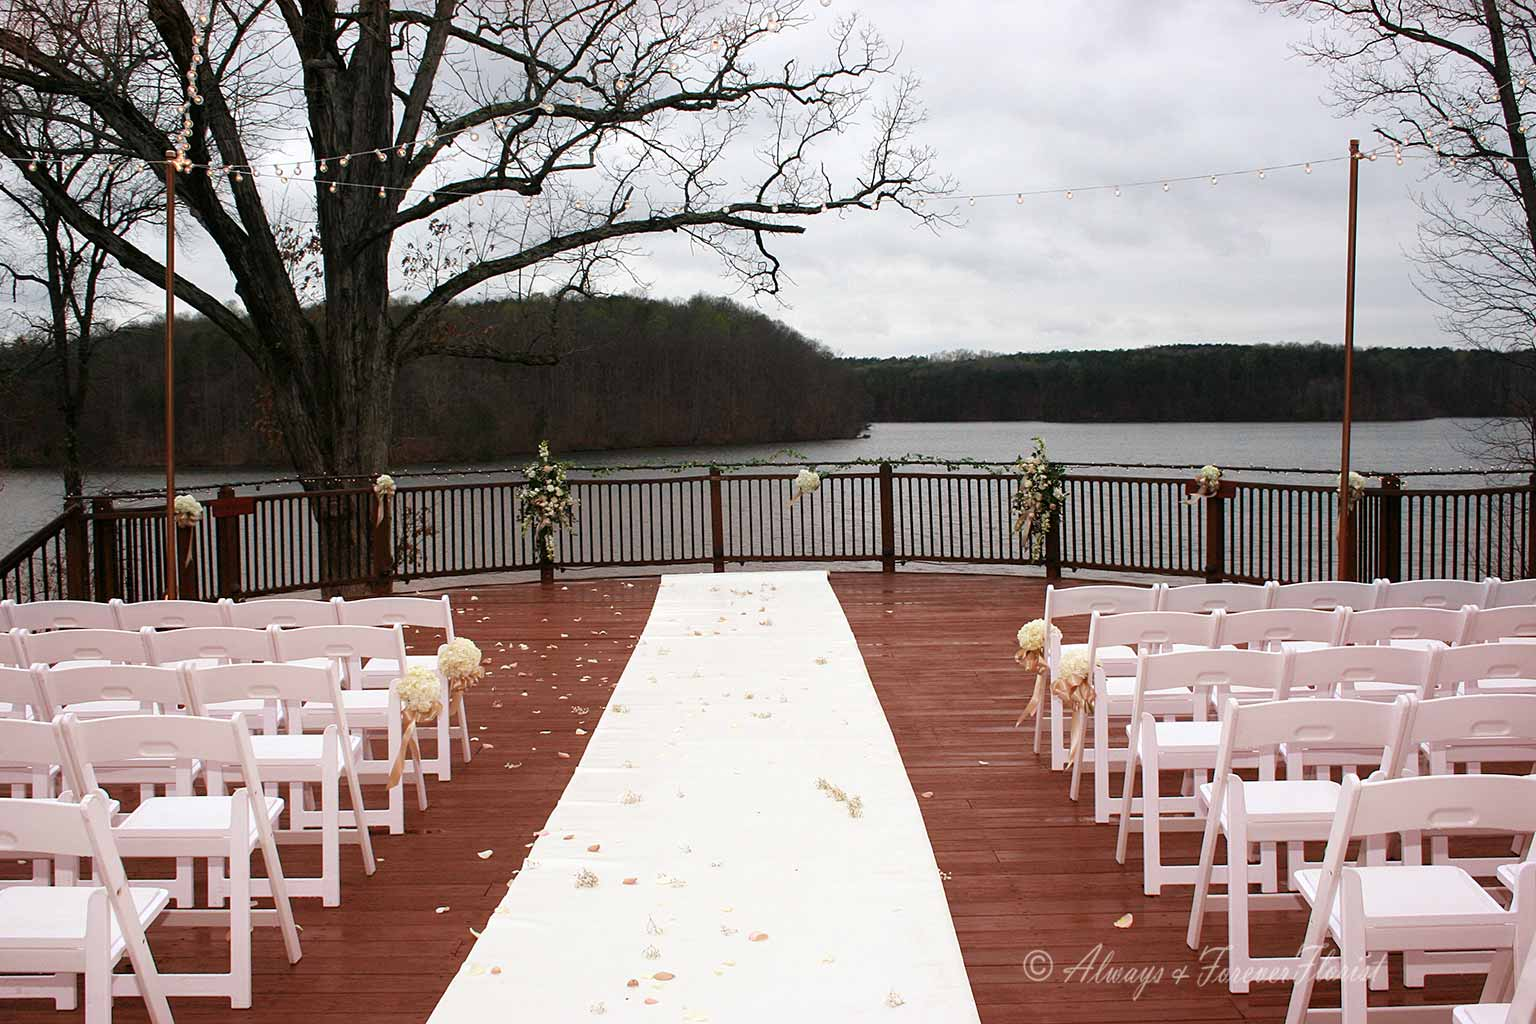 Rainy day wedding on the Bella Collina deck